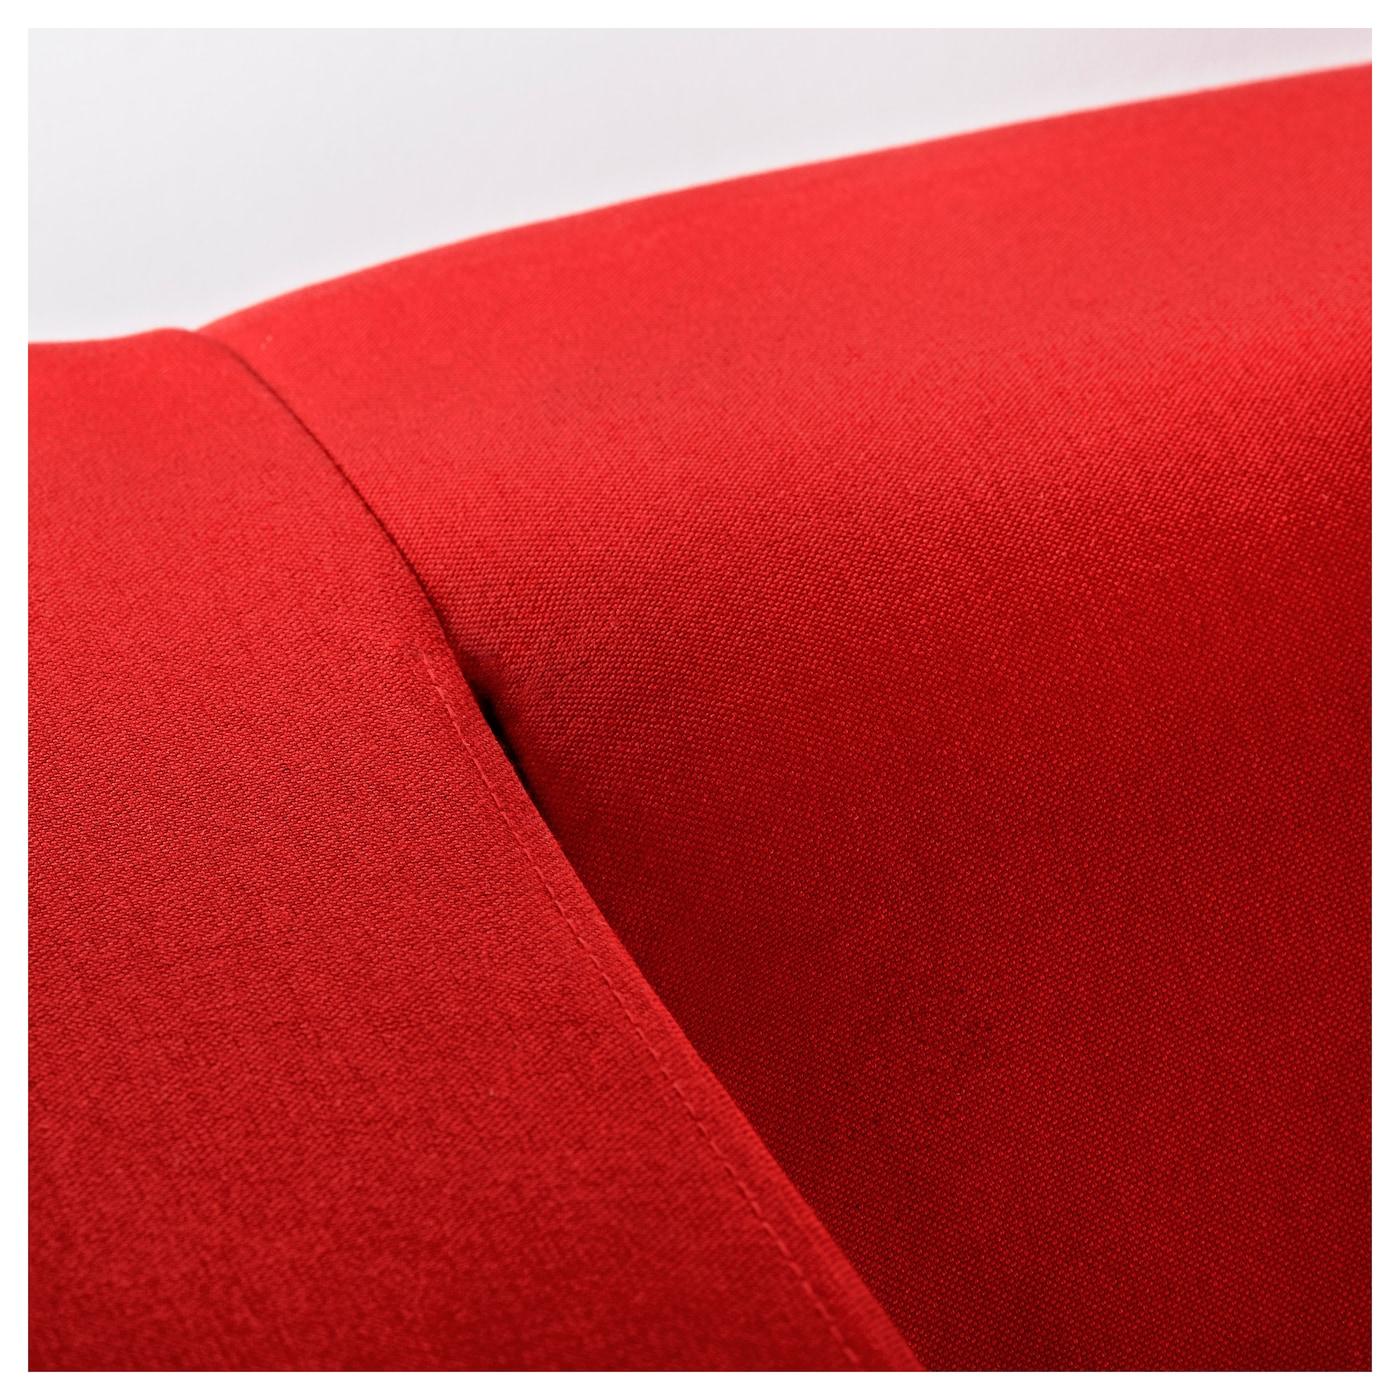 KLIPPAN Two seat sofa Flackarp red orange IKEA